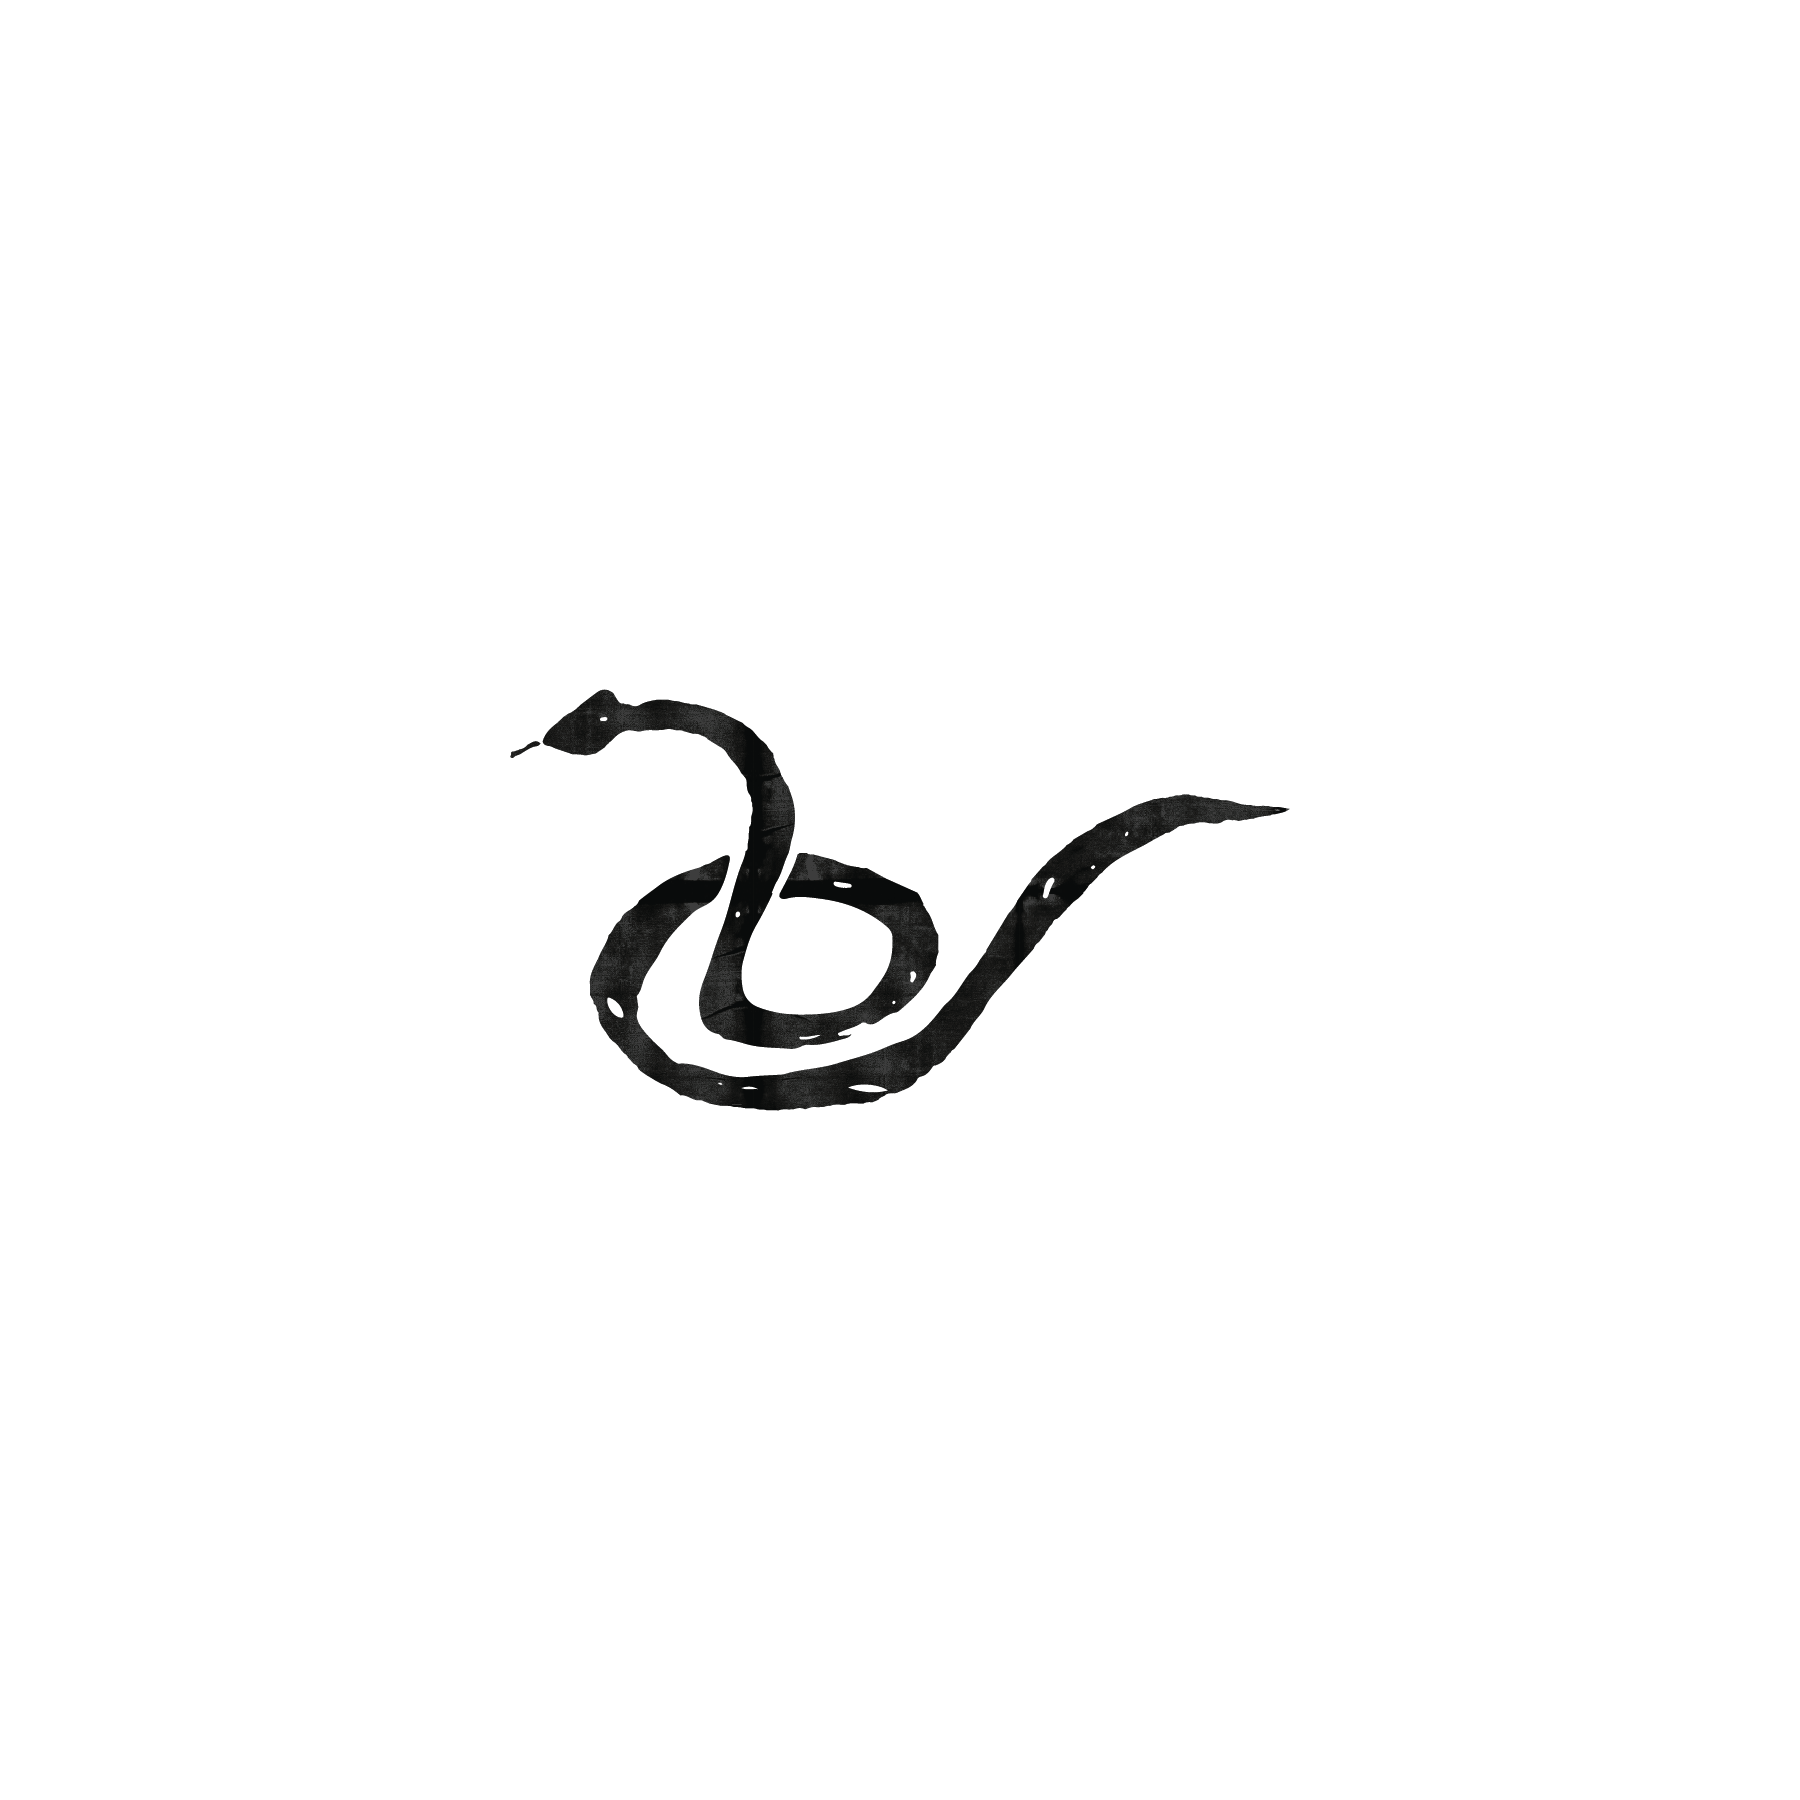 snake-01.png